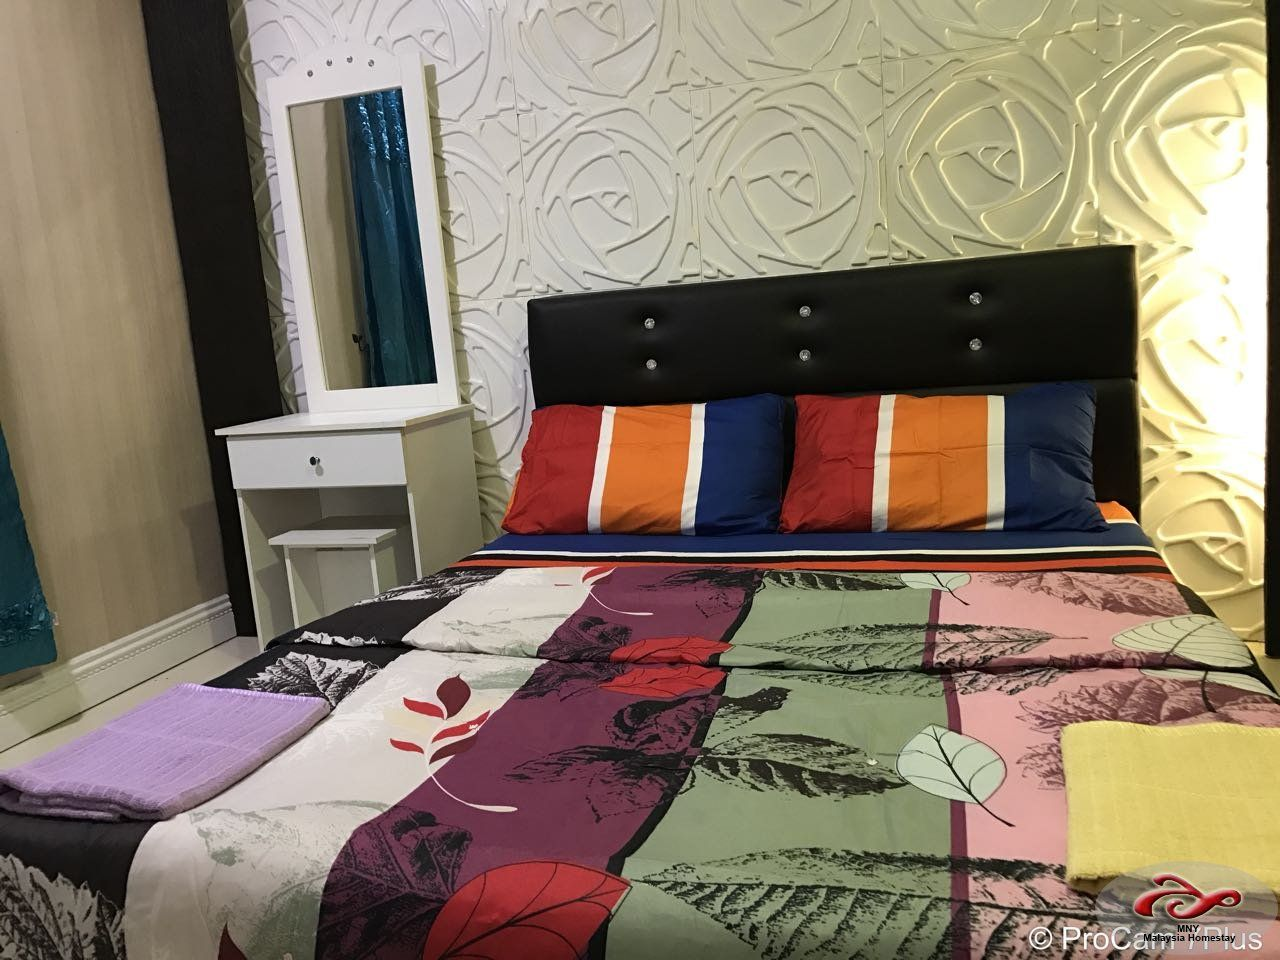 Homestay Langkawi Kemudahan Lovely And Beautiful Eco House 3 Bilik Tidur Katil Queen Dan 2 Single Bed Aircond 1 Kipas Tilam